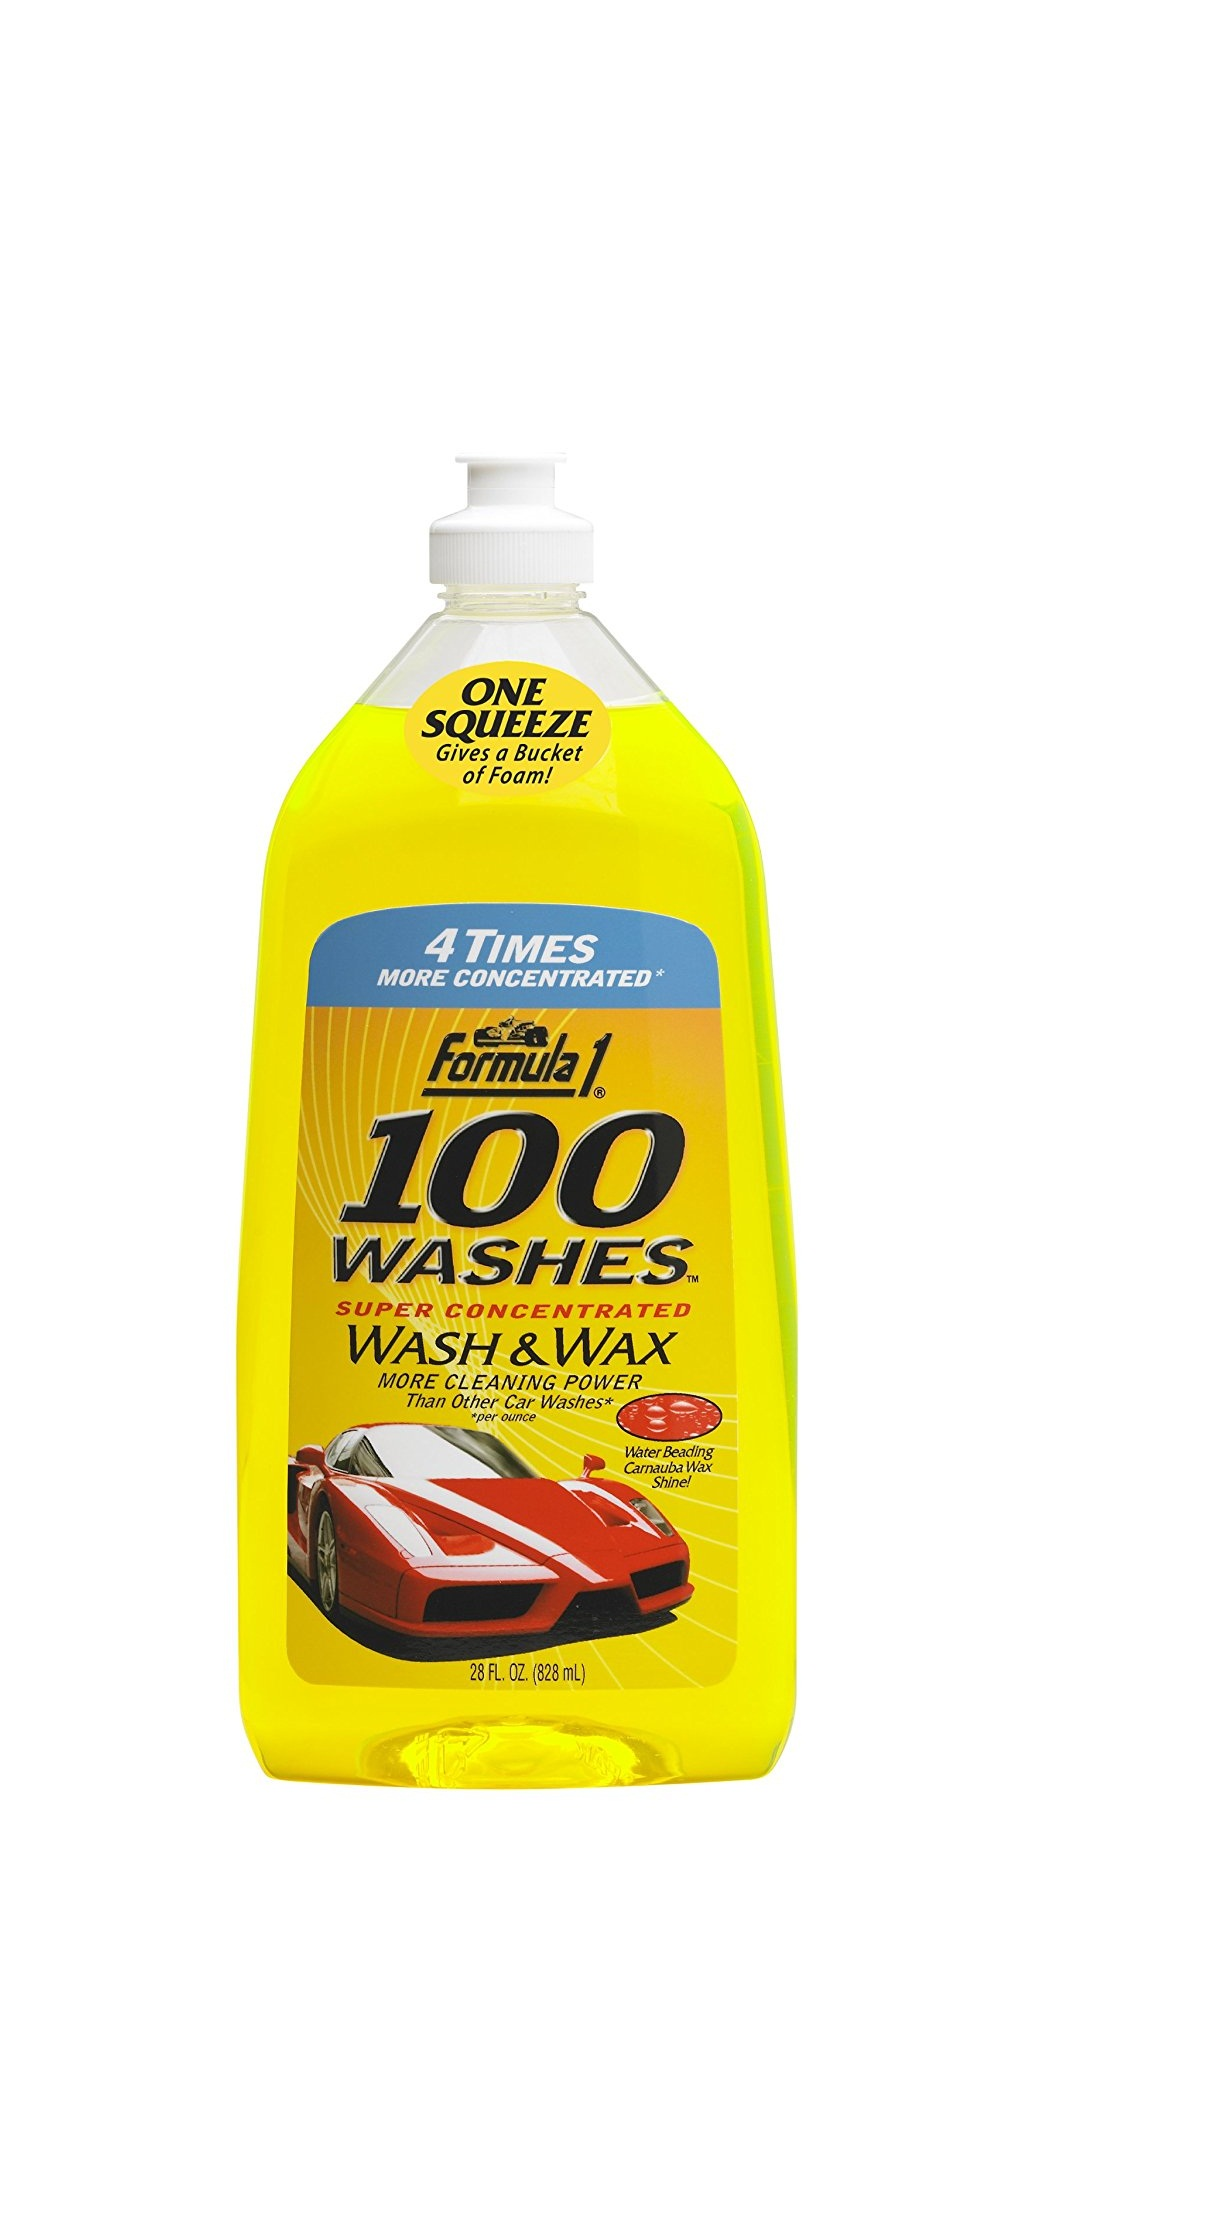 formula1 100 Washes Wash and Wax 828ml  New